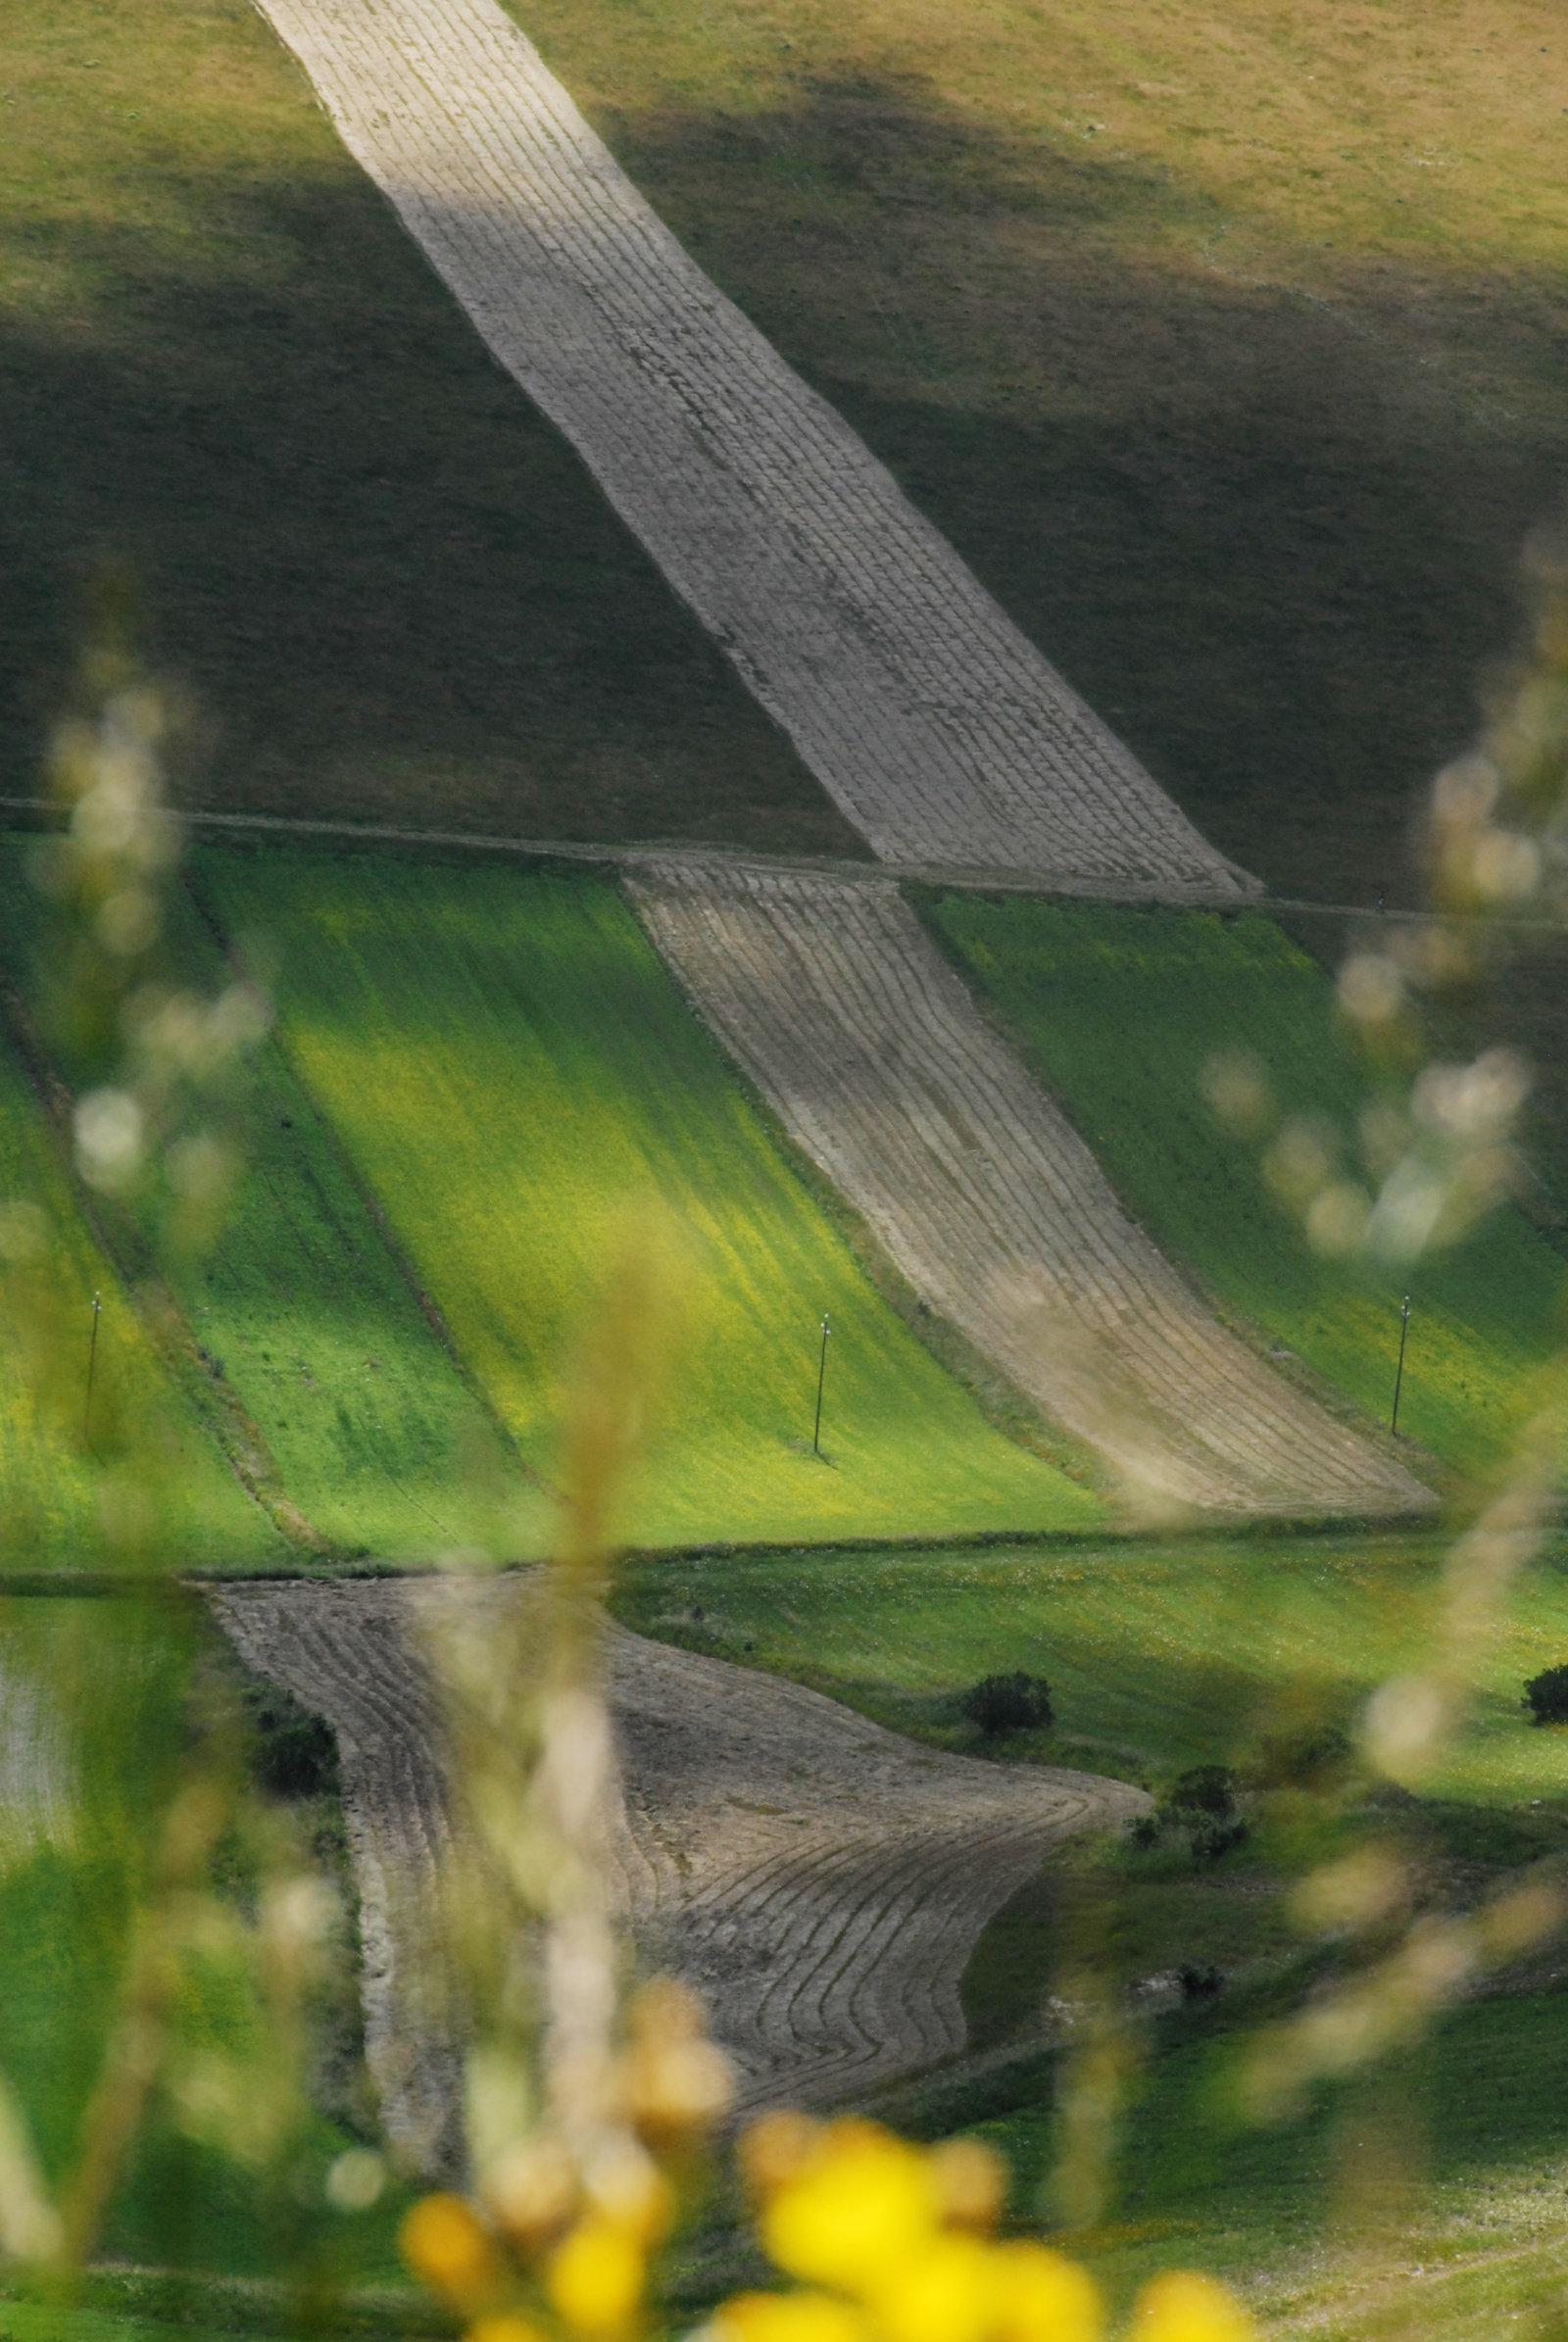 2014-la-fiorita-2a-773-fileminimizer